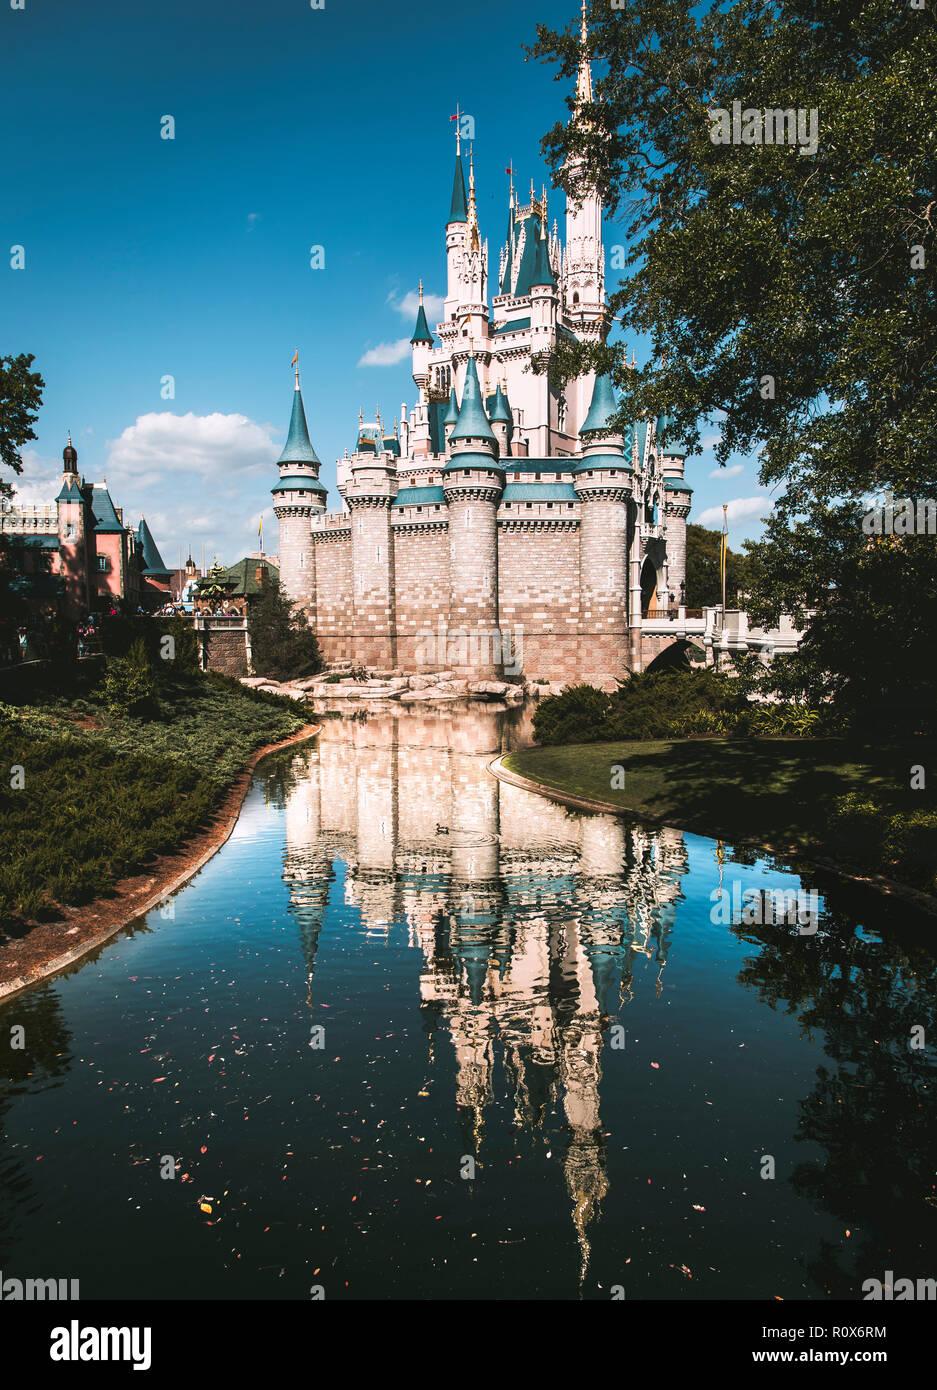 Orlando Attraction Stock Photo